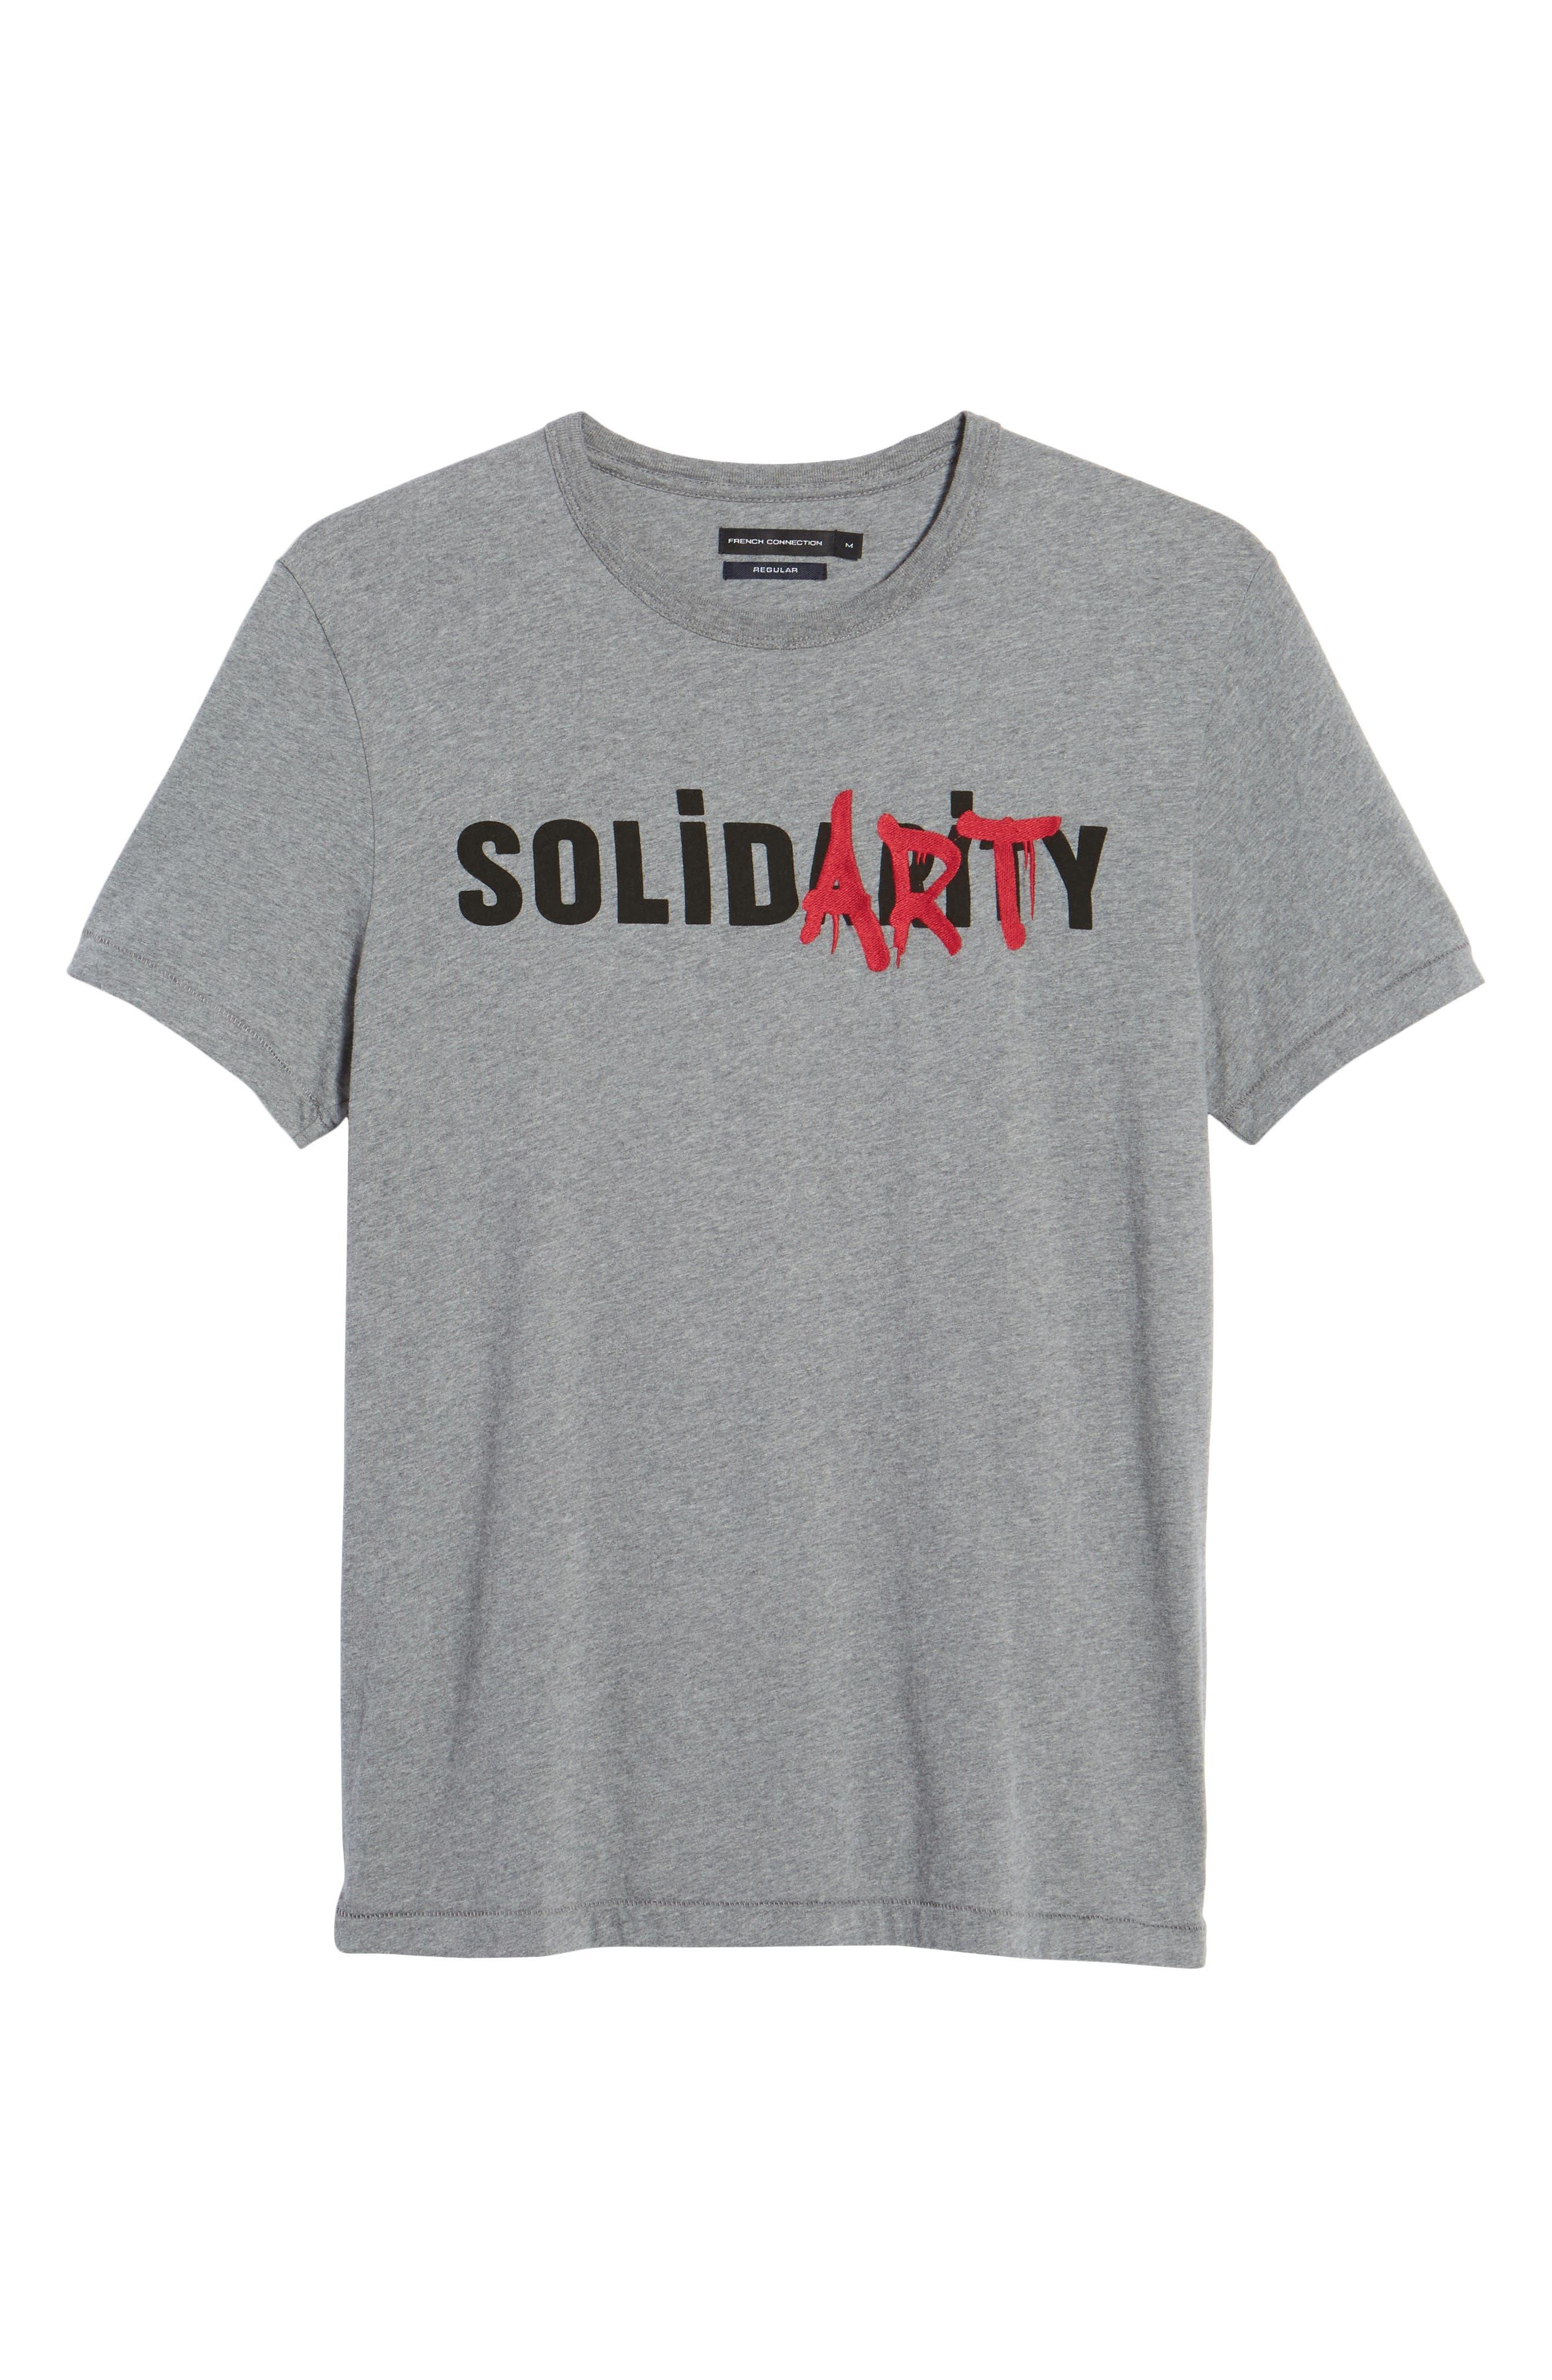 Solidarity Slim Fit Crewneck T-Shirt,                             Alternate thumbnail 6, color,                             Mid Grey Melange/ Black